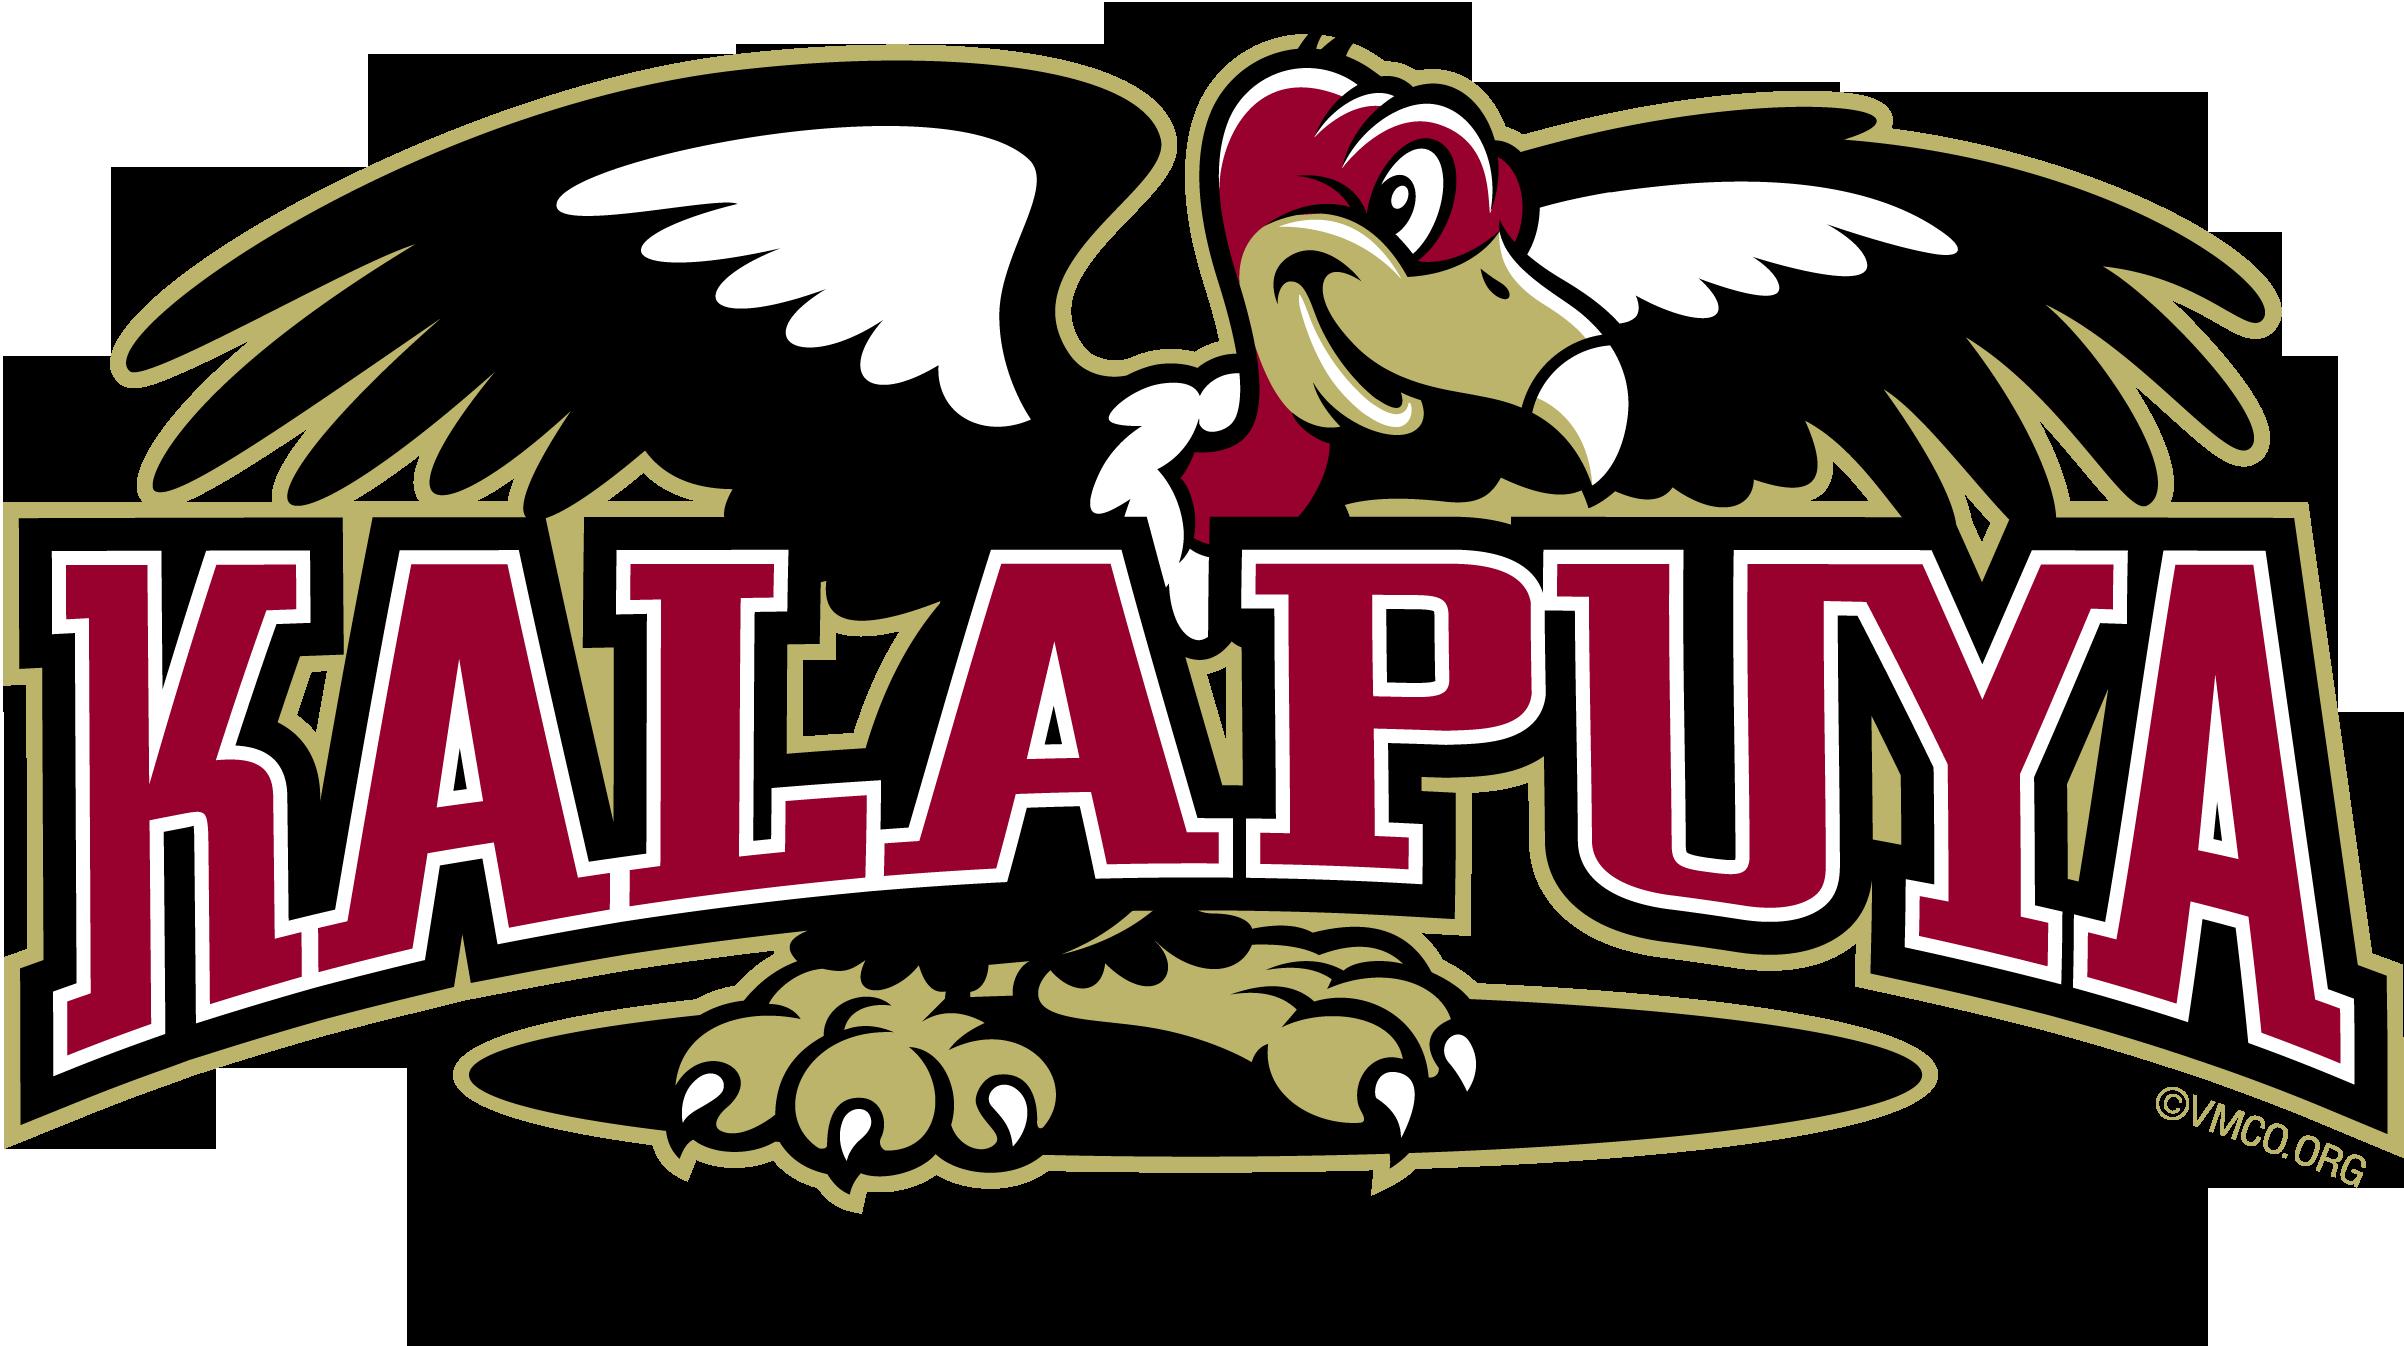 large version of the official Kalapuya logo